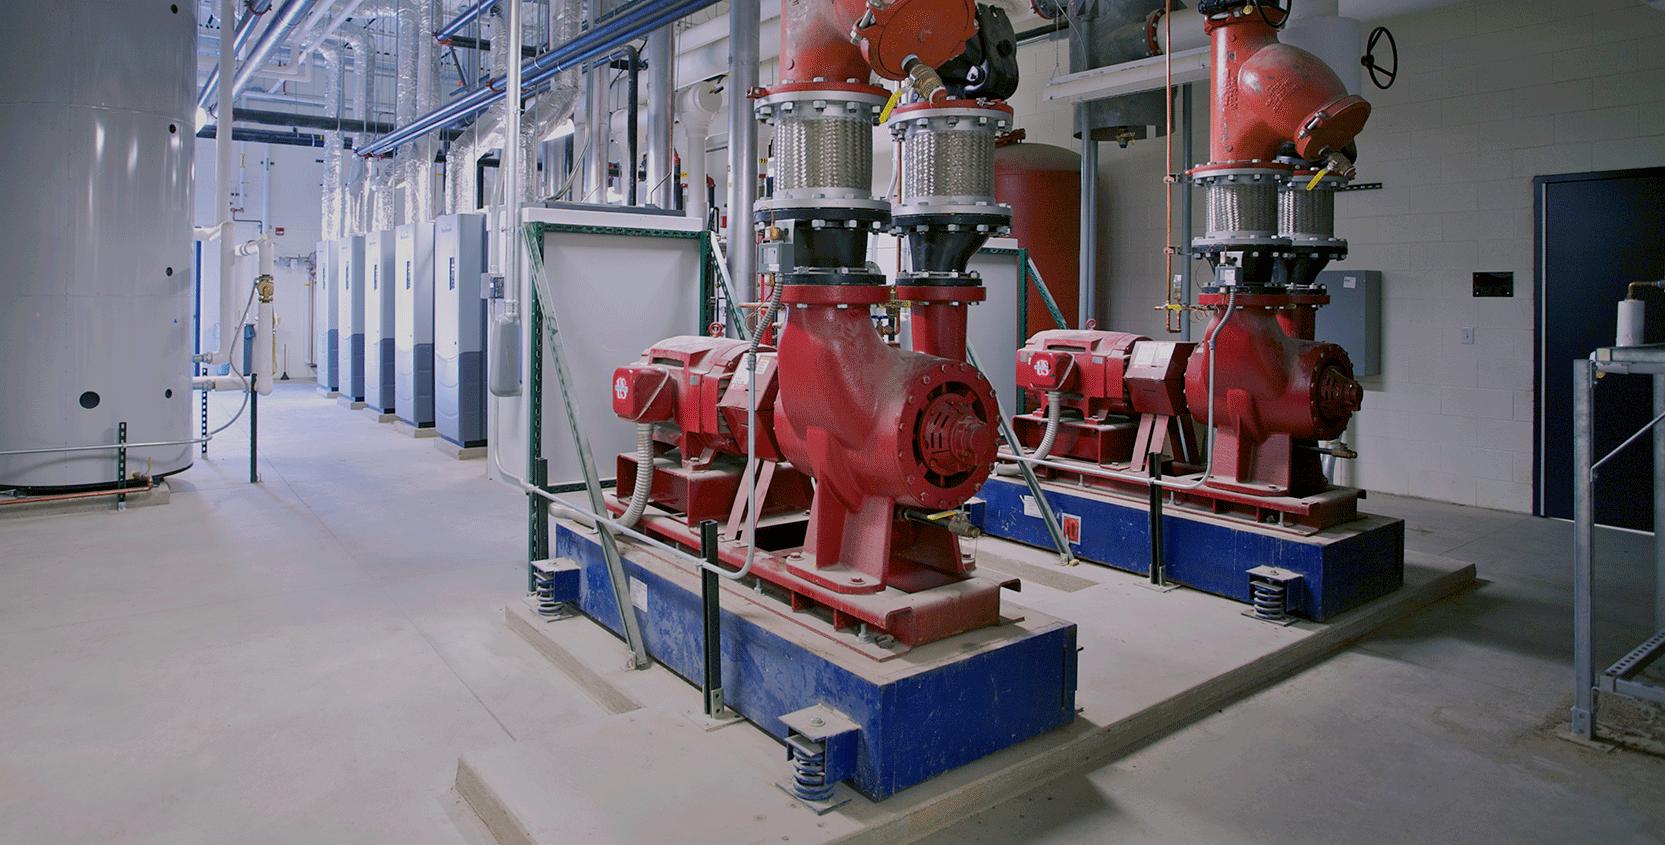 Portage-Central-HS-Mechanical-Equipment-2-1665x845